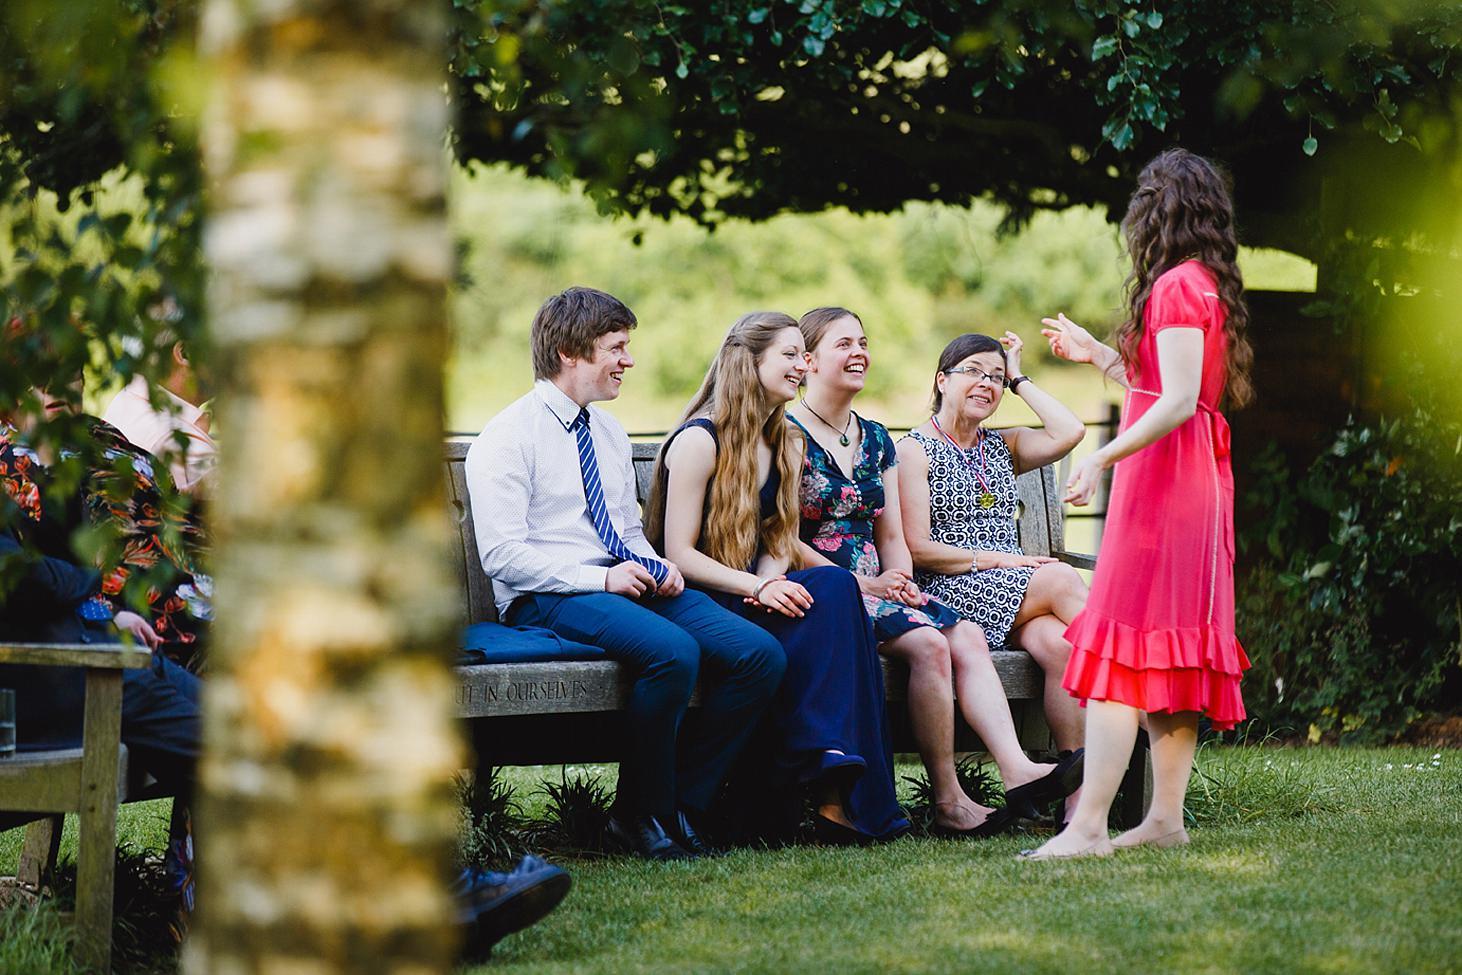 gate street barn wedding photography wedding guests talking